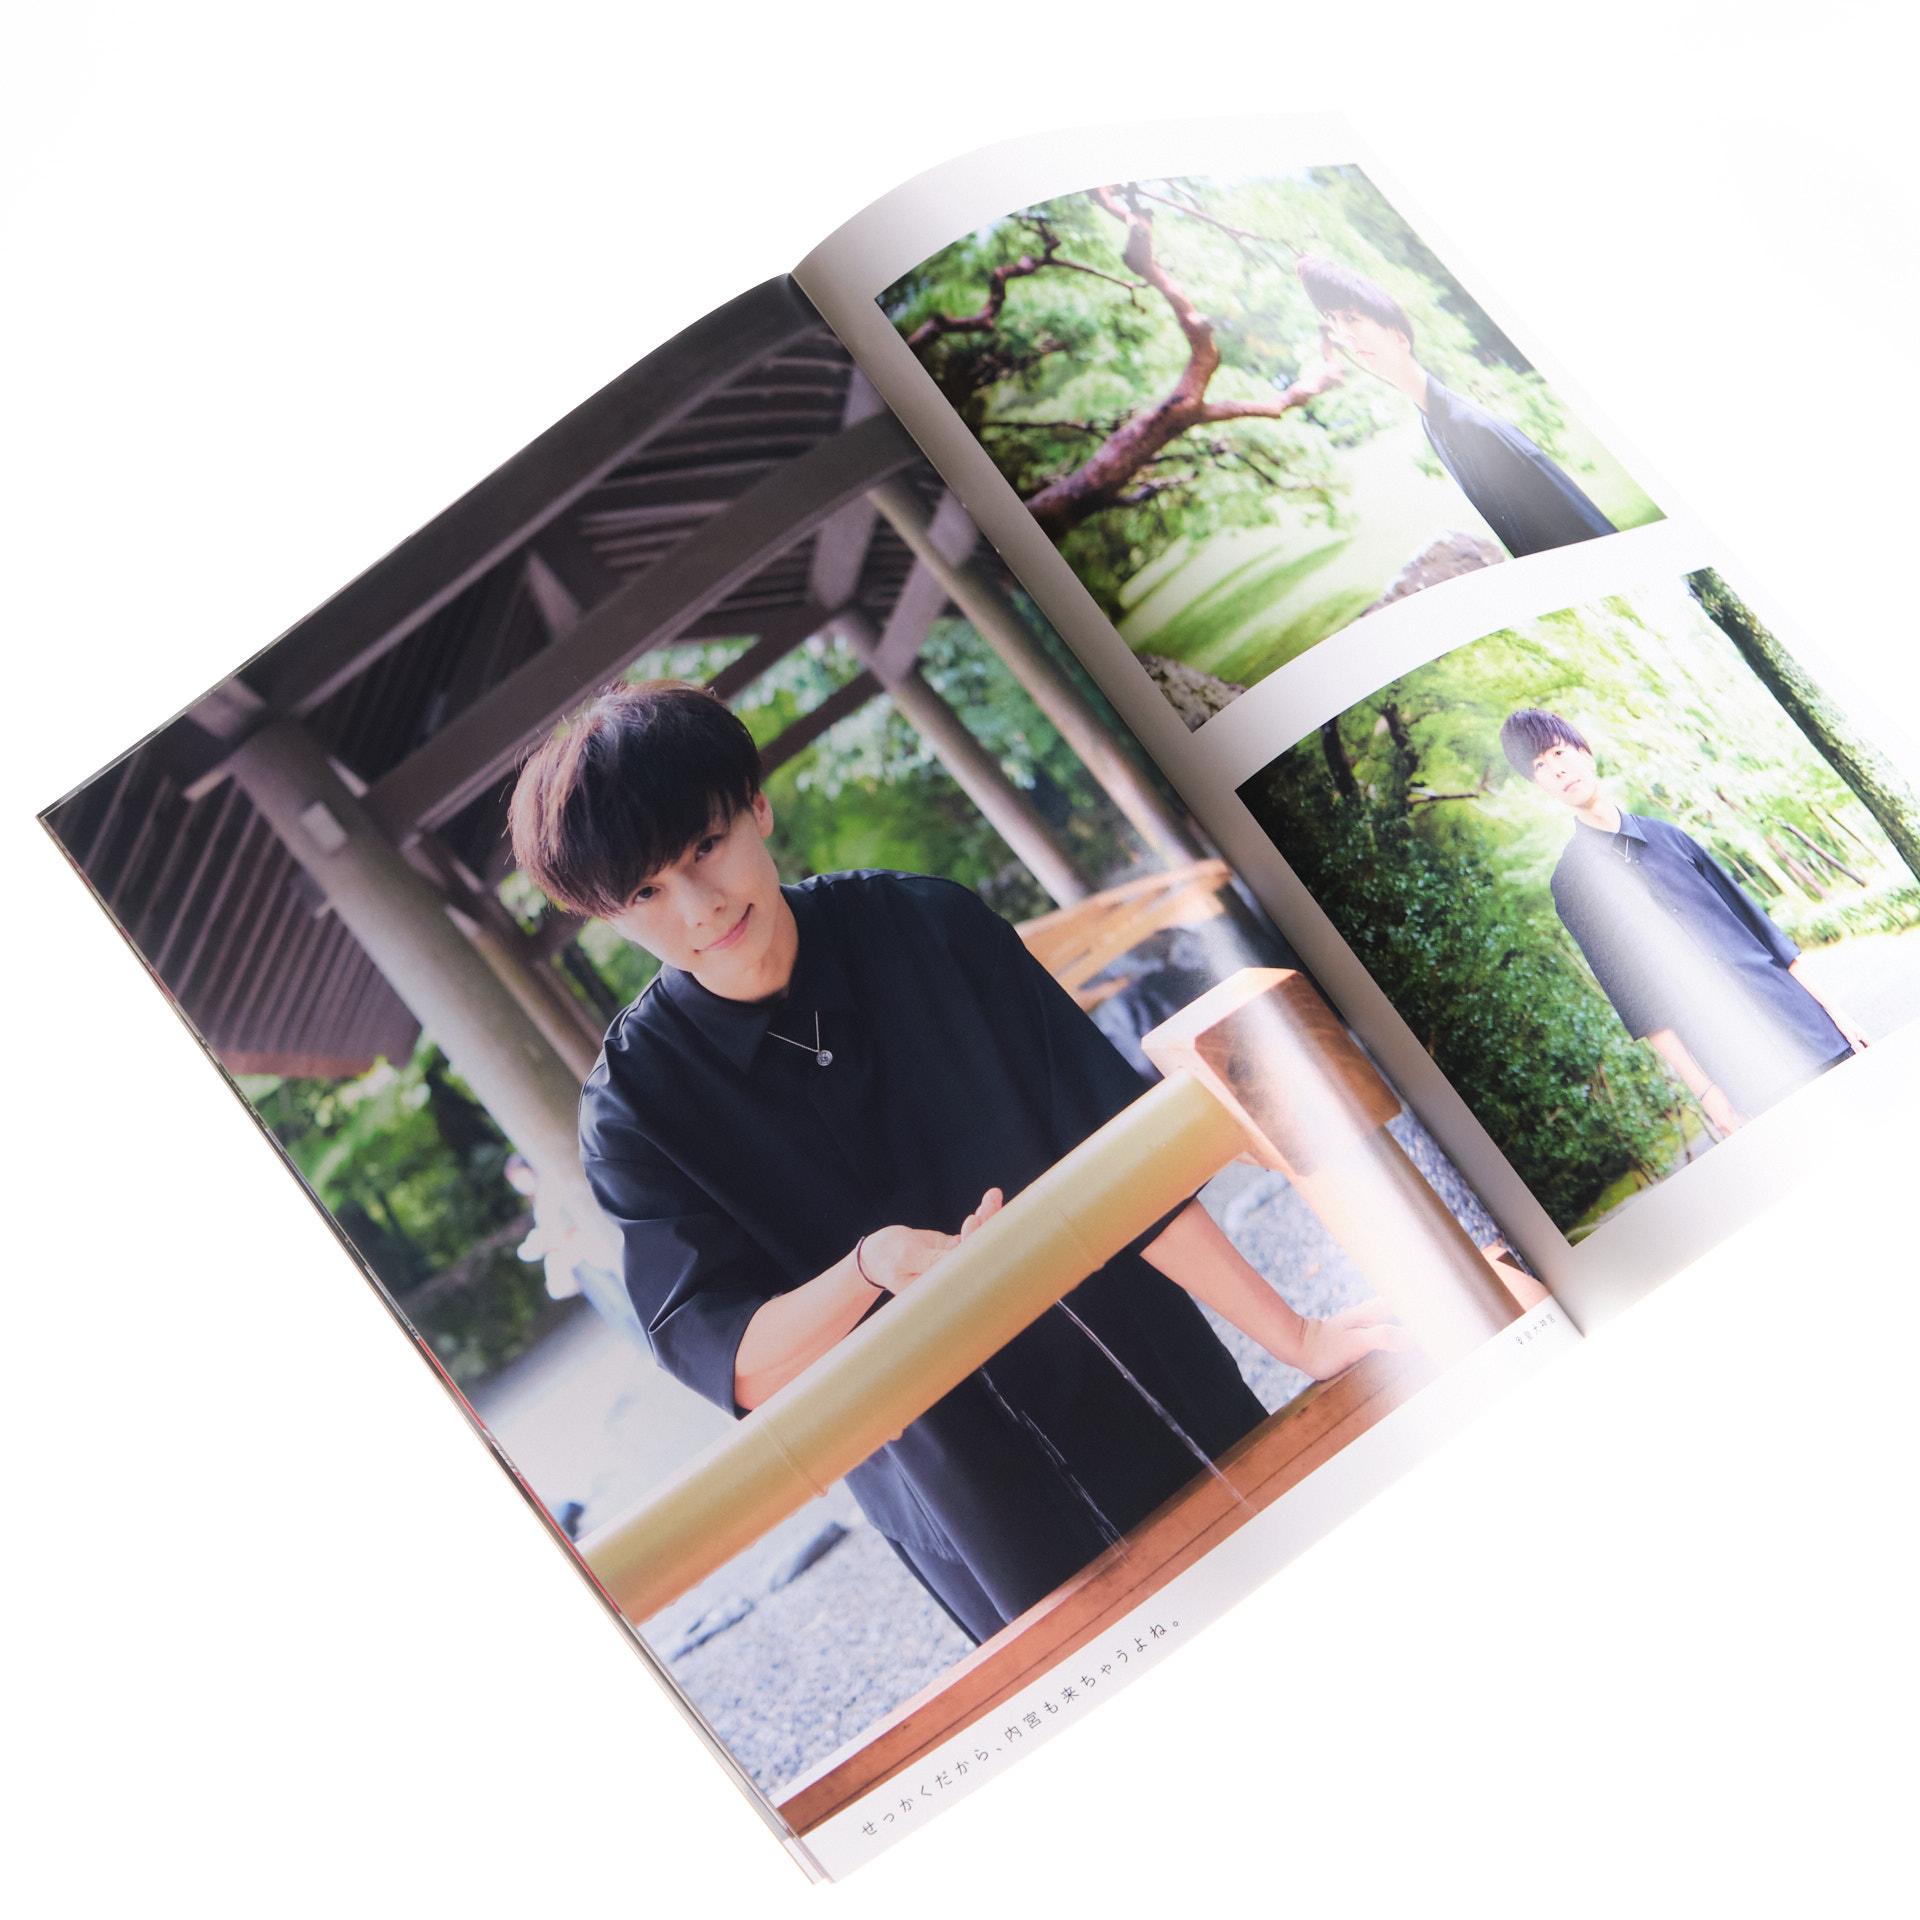 2020.10.23 DC夕霧コラボ・チェーン・葵ソログッズ5923.jpg